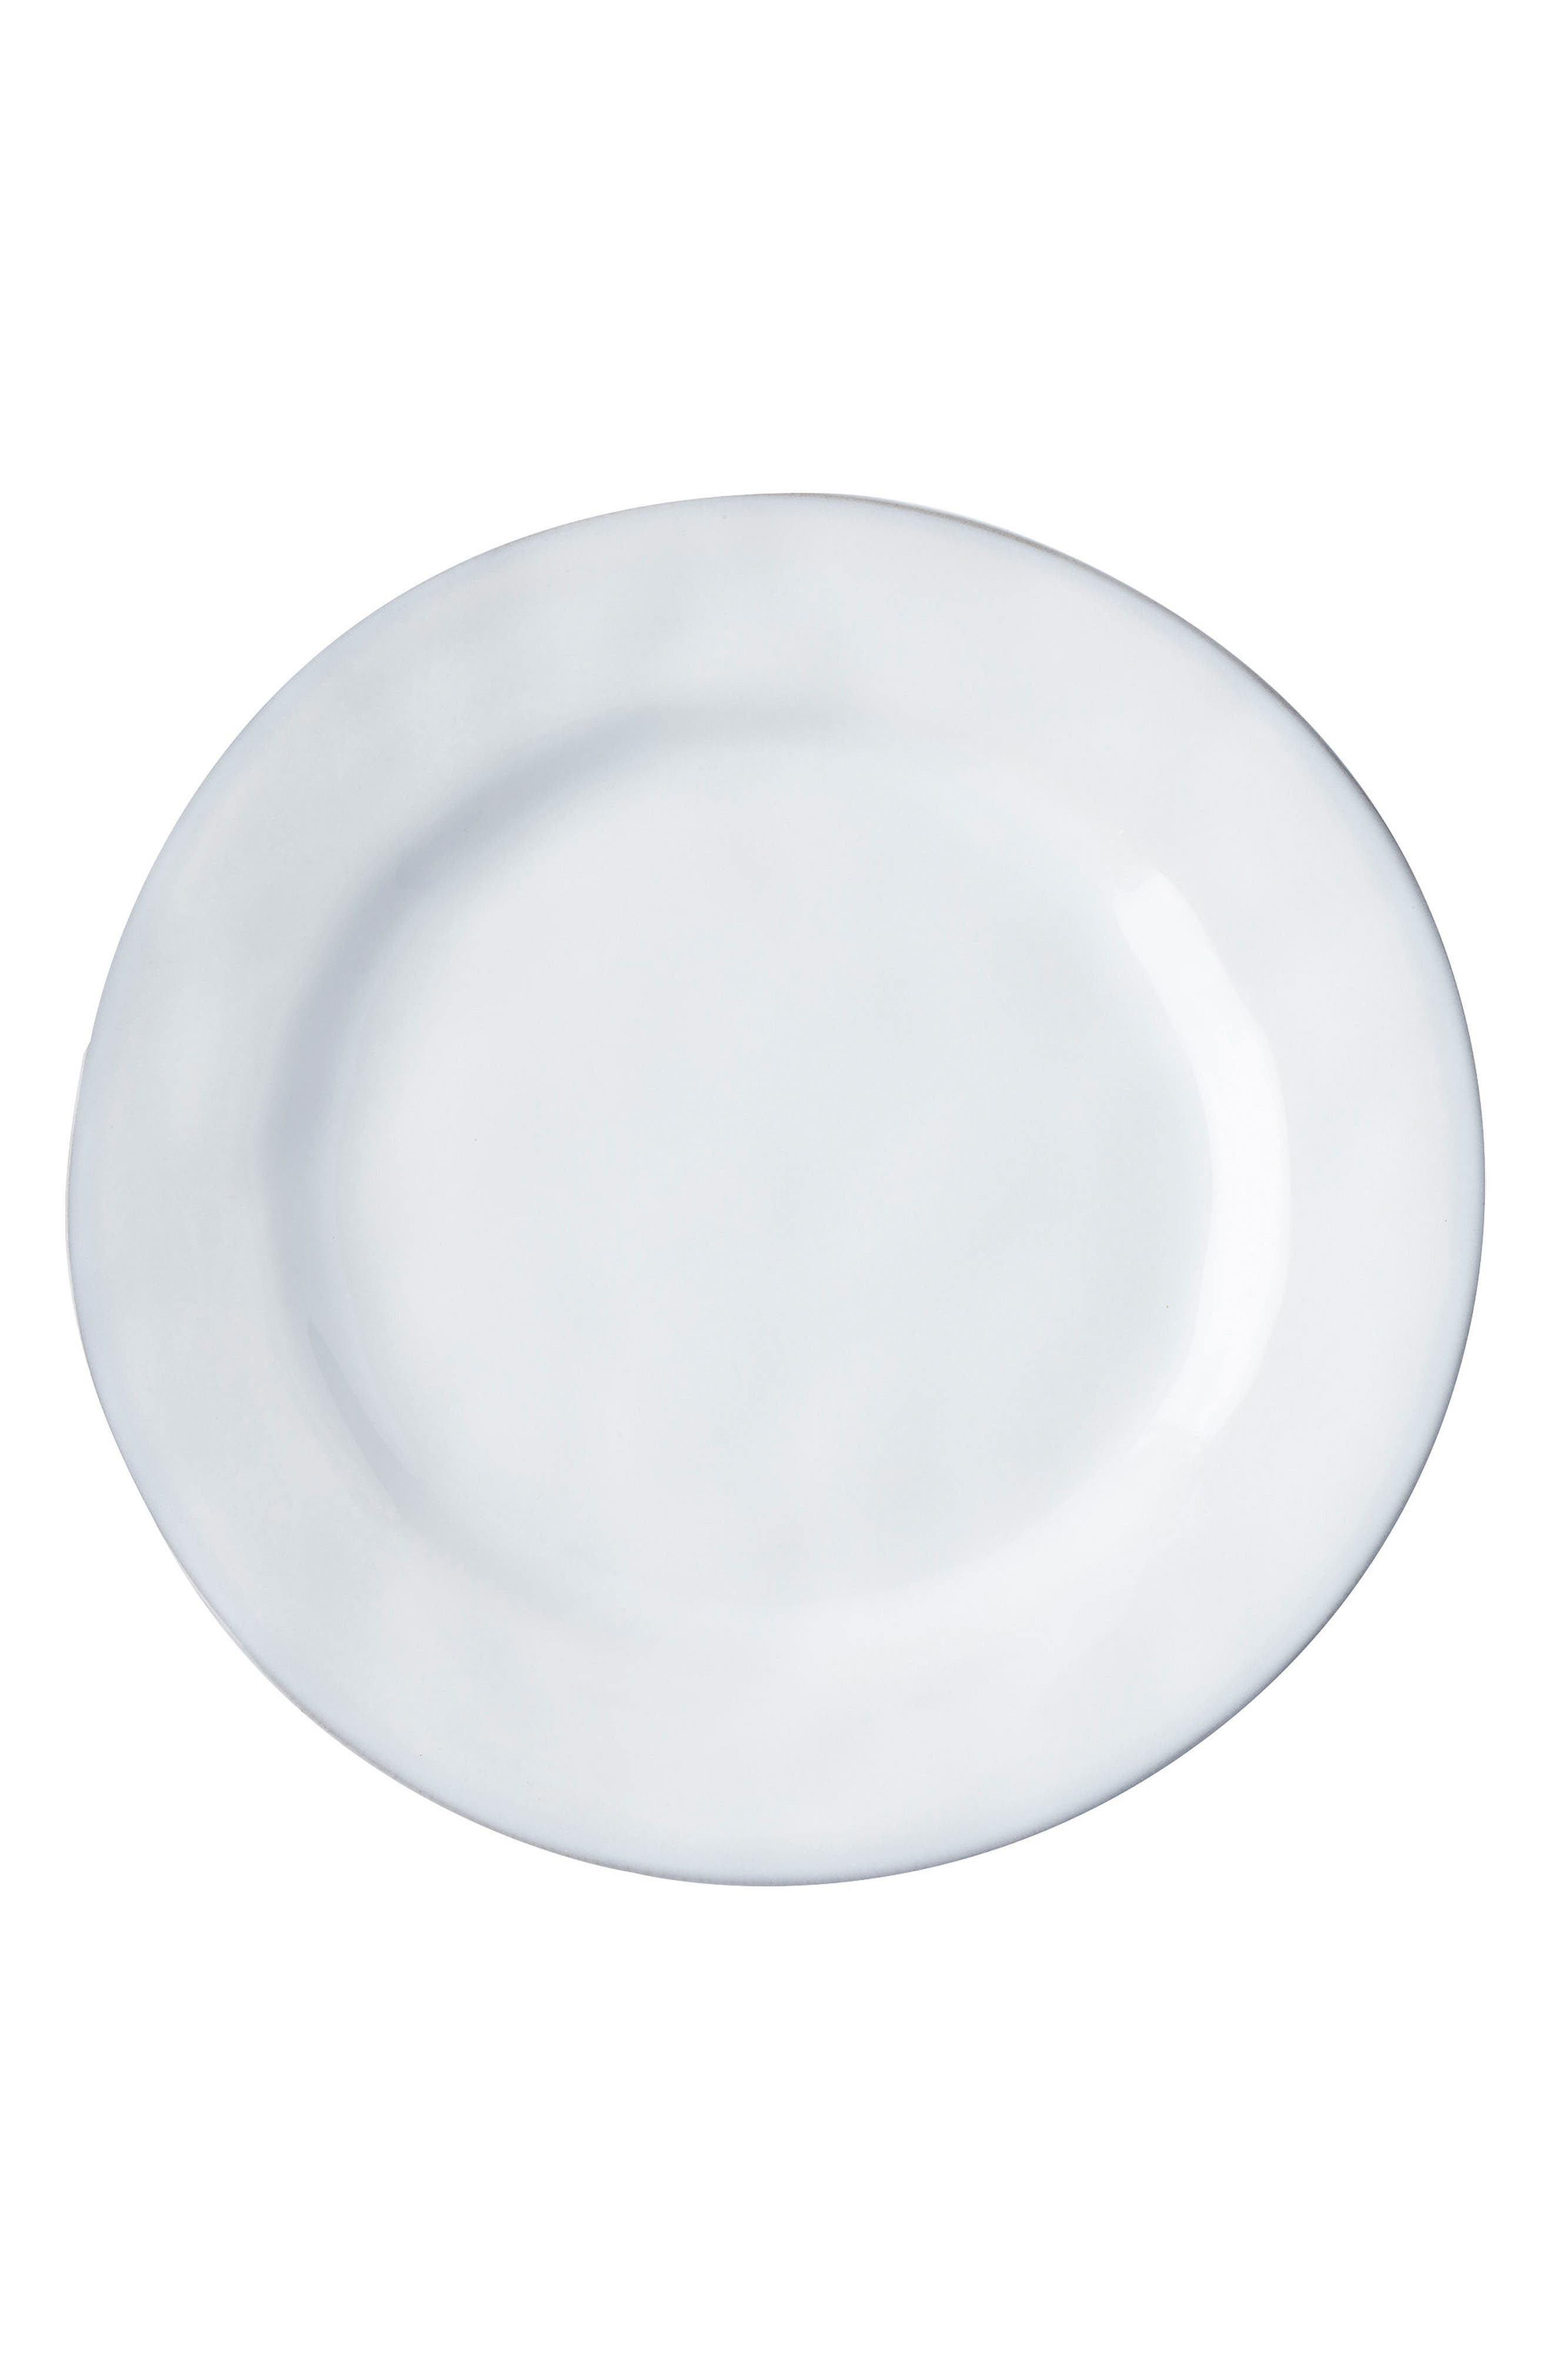 Quotidien White Truffle Dessert/Salad Plate,                         Main,                         color, White